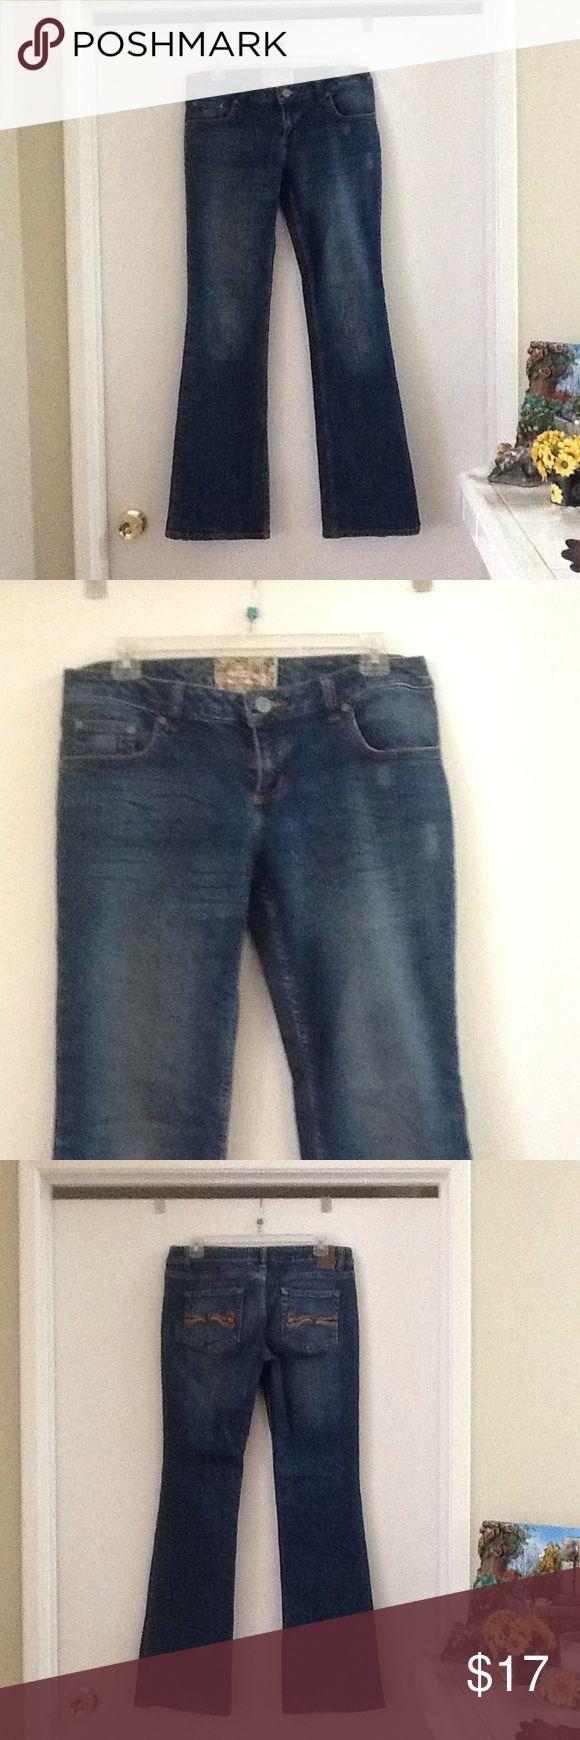 American Rag Blue jeans pants American Rag Blue jeans pants , decorated back pocket, 99% cotton, 1% spandex American Rag Jeans